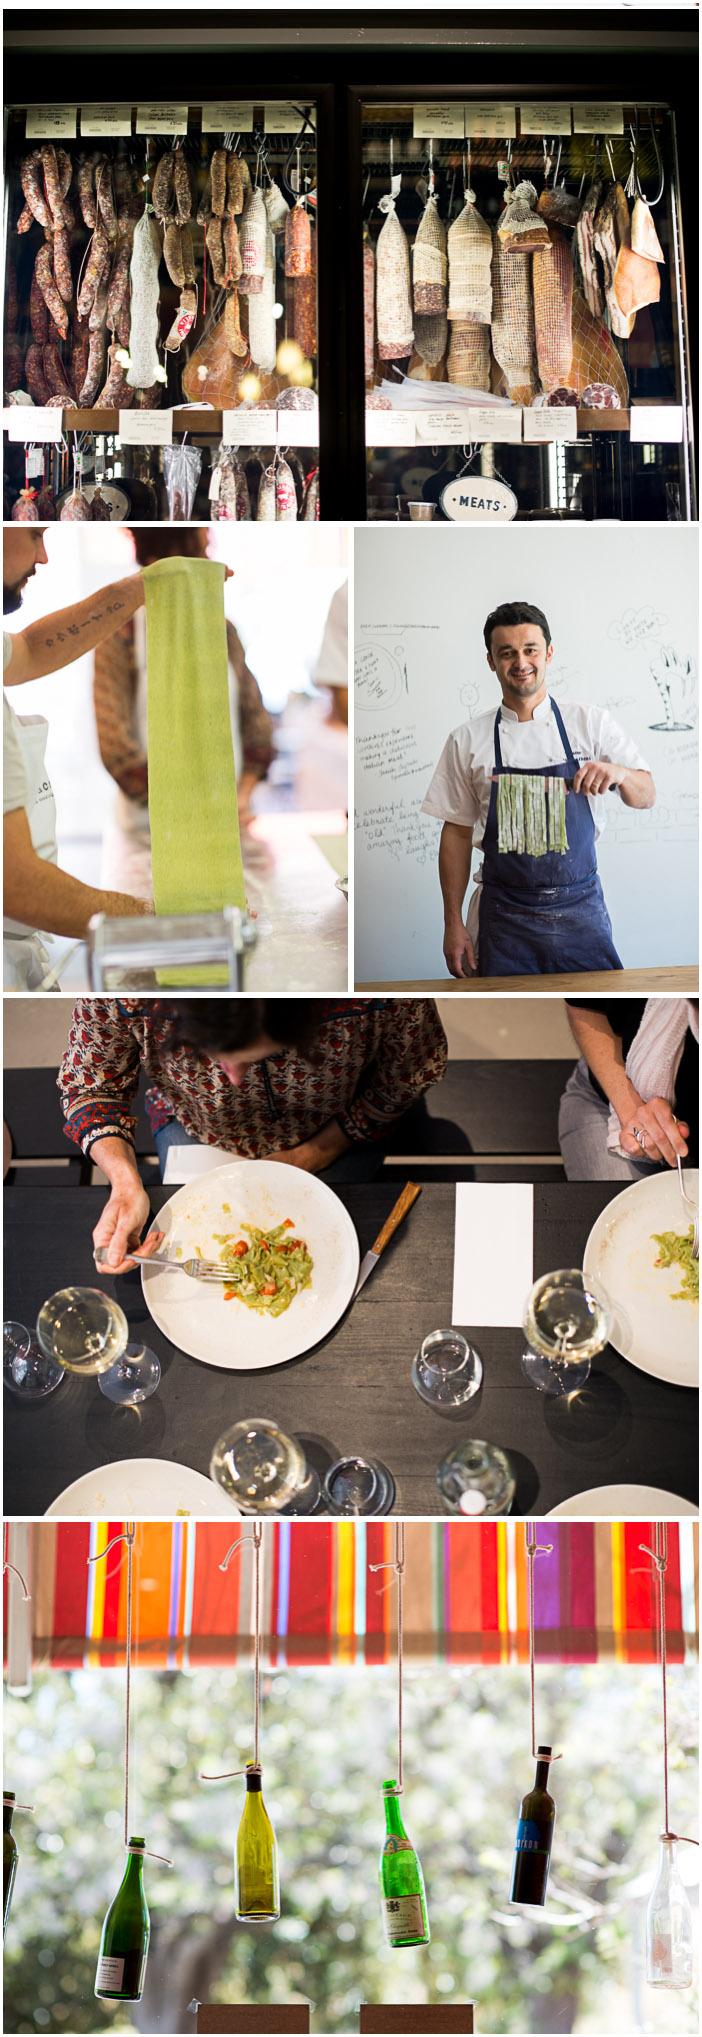 Australia Food & Wine Stories on WhiteOnRiceCouple.com